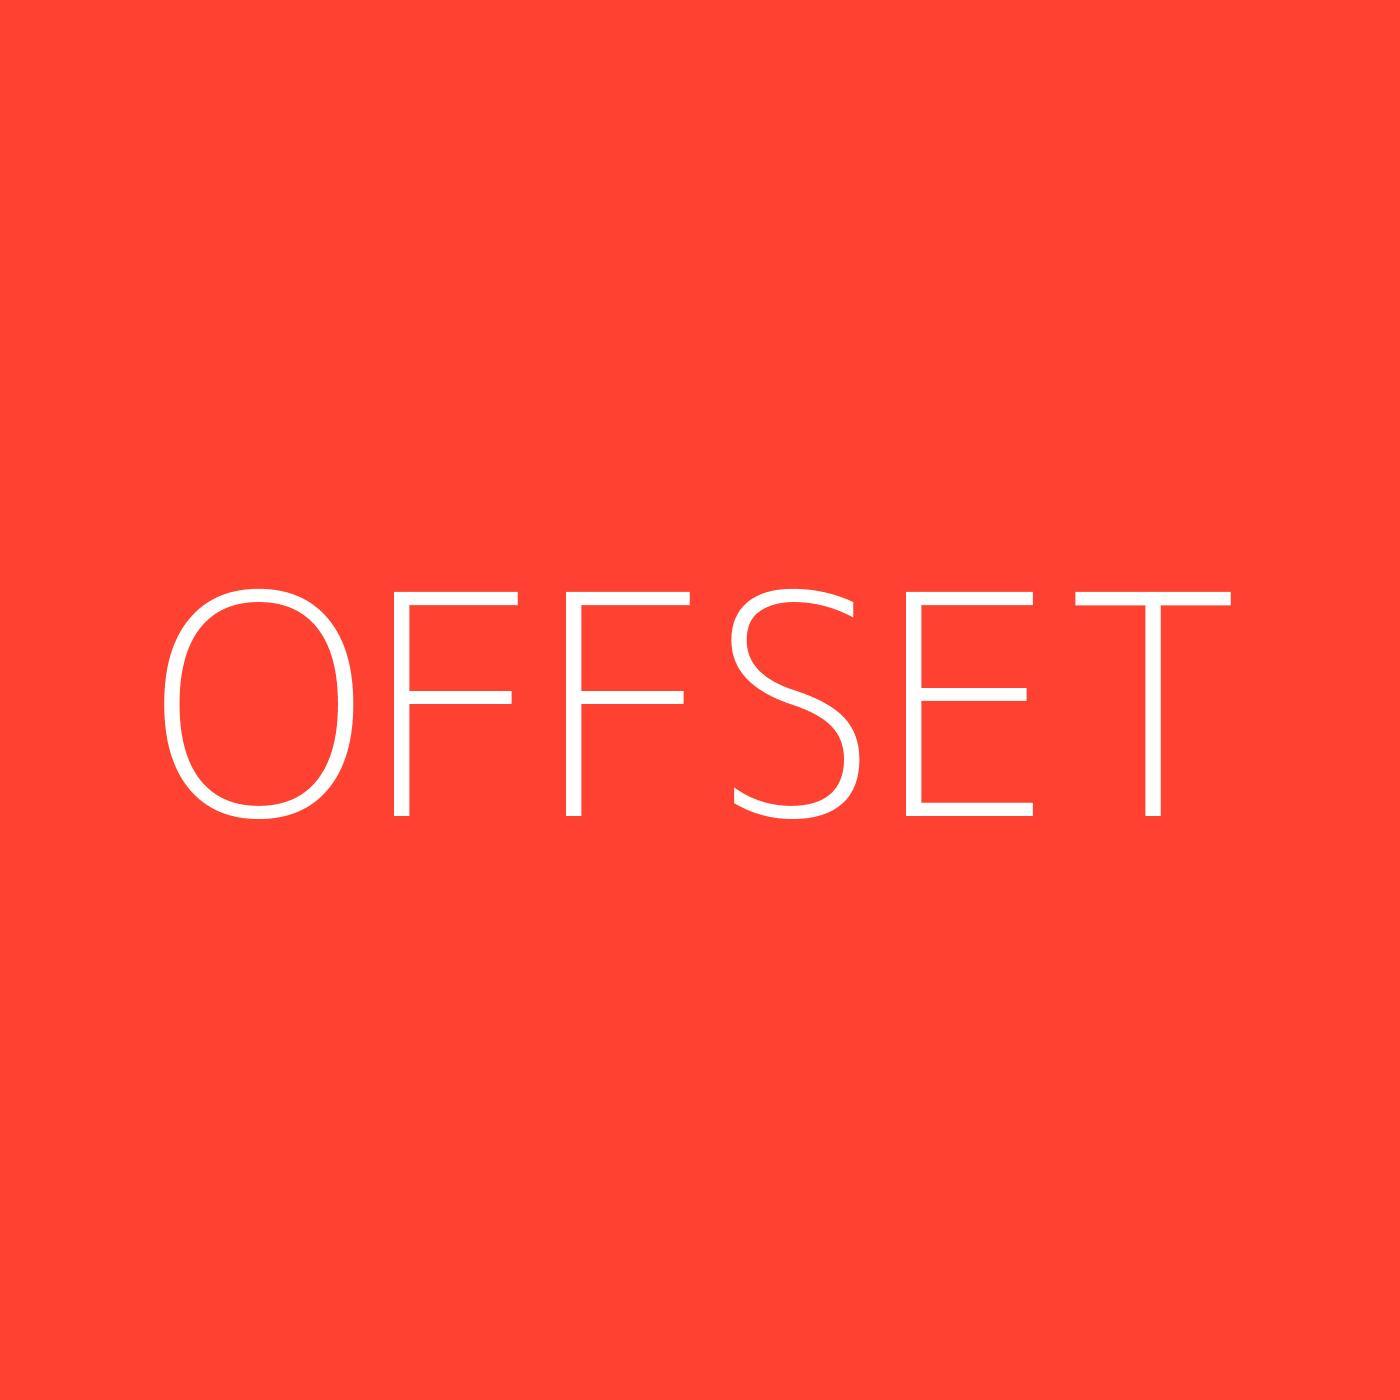 Offset Playlist Artwork